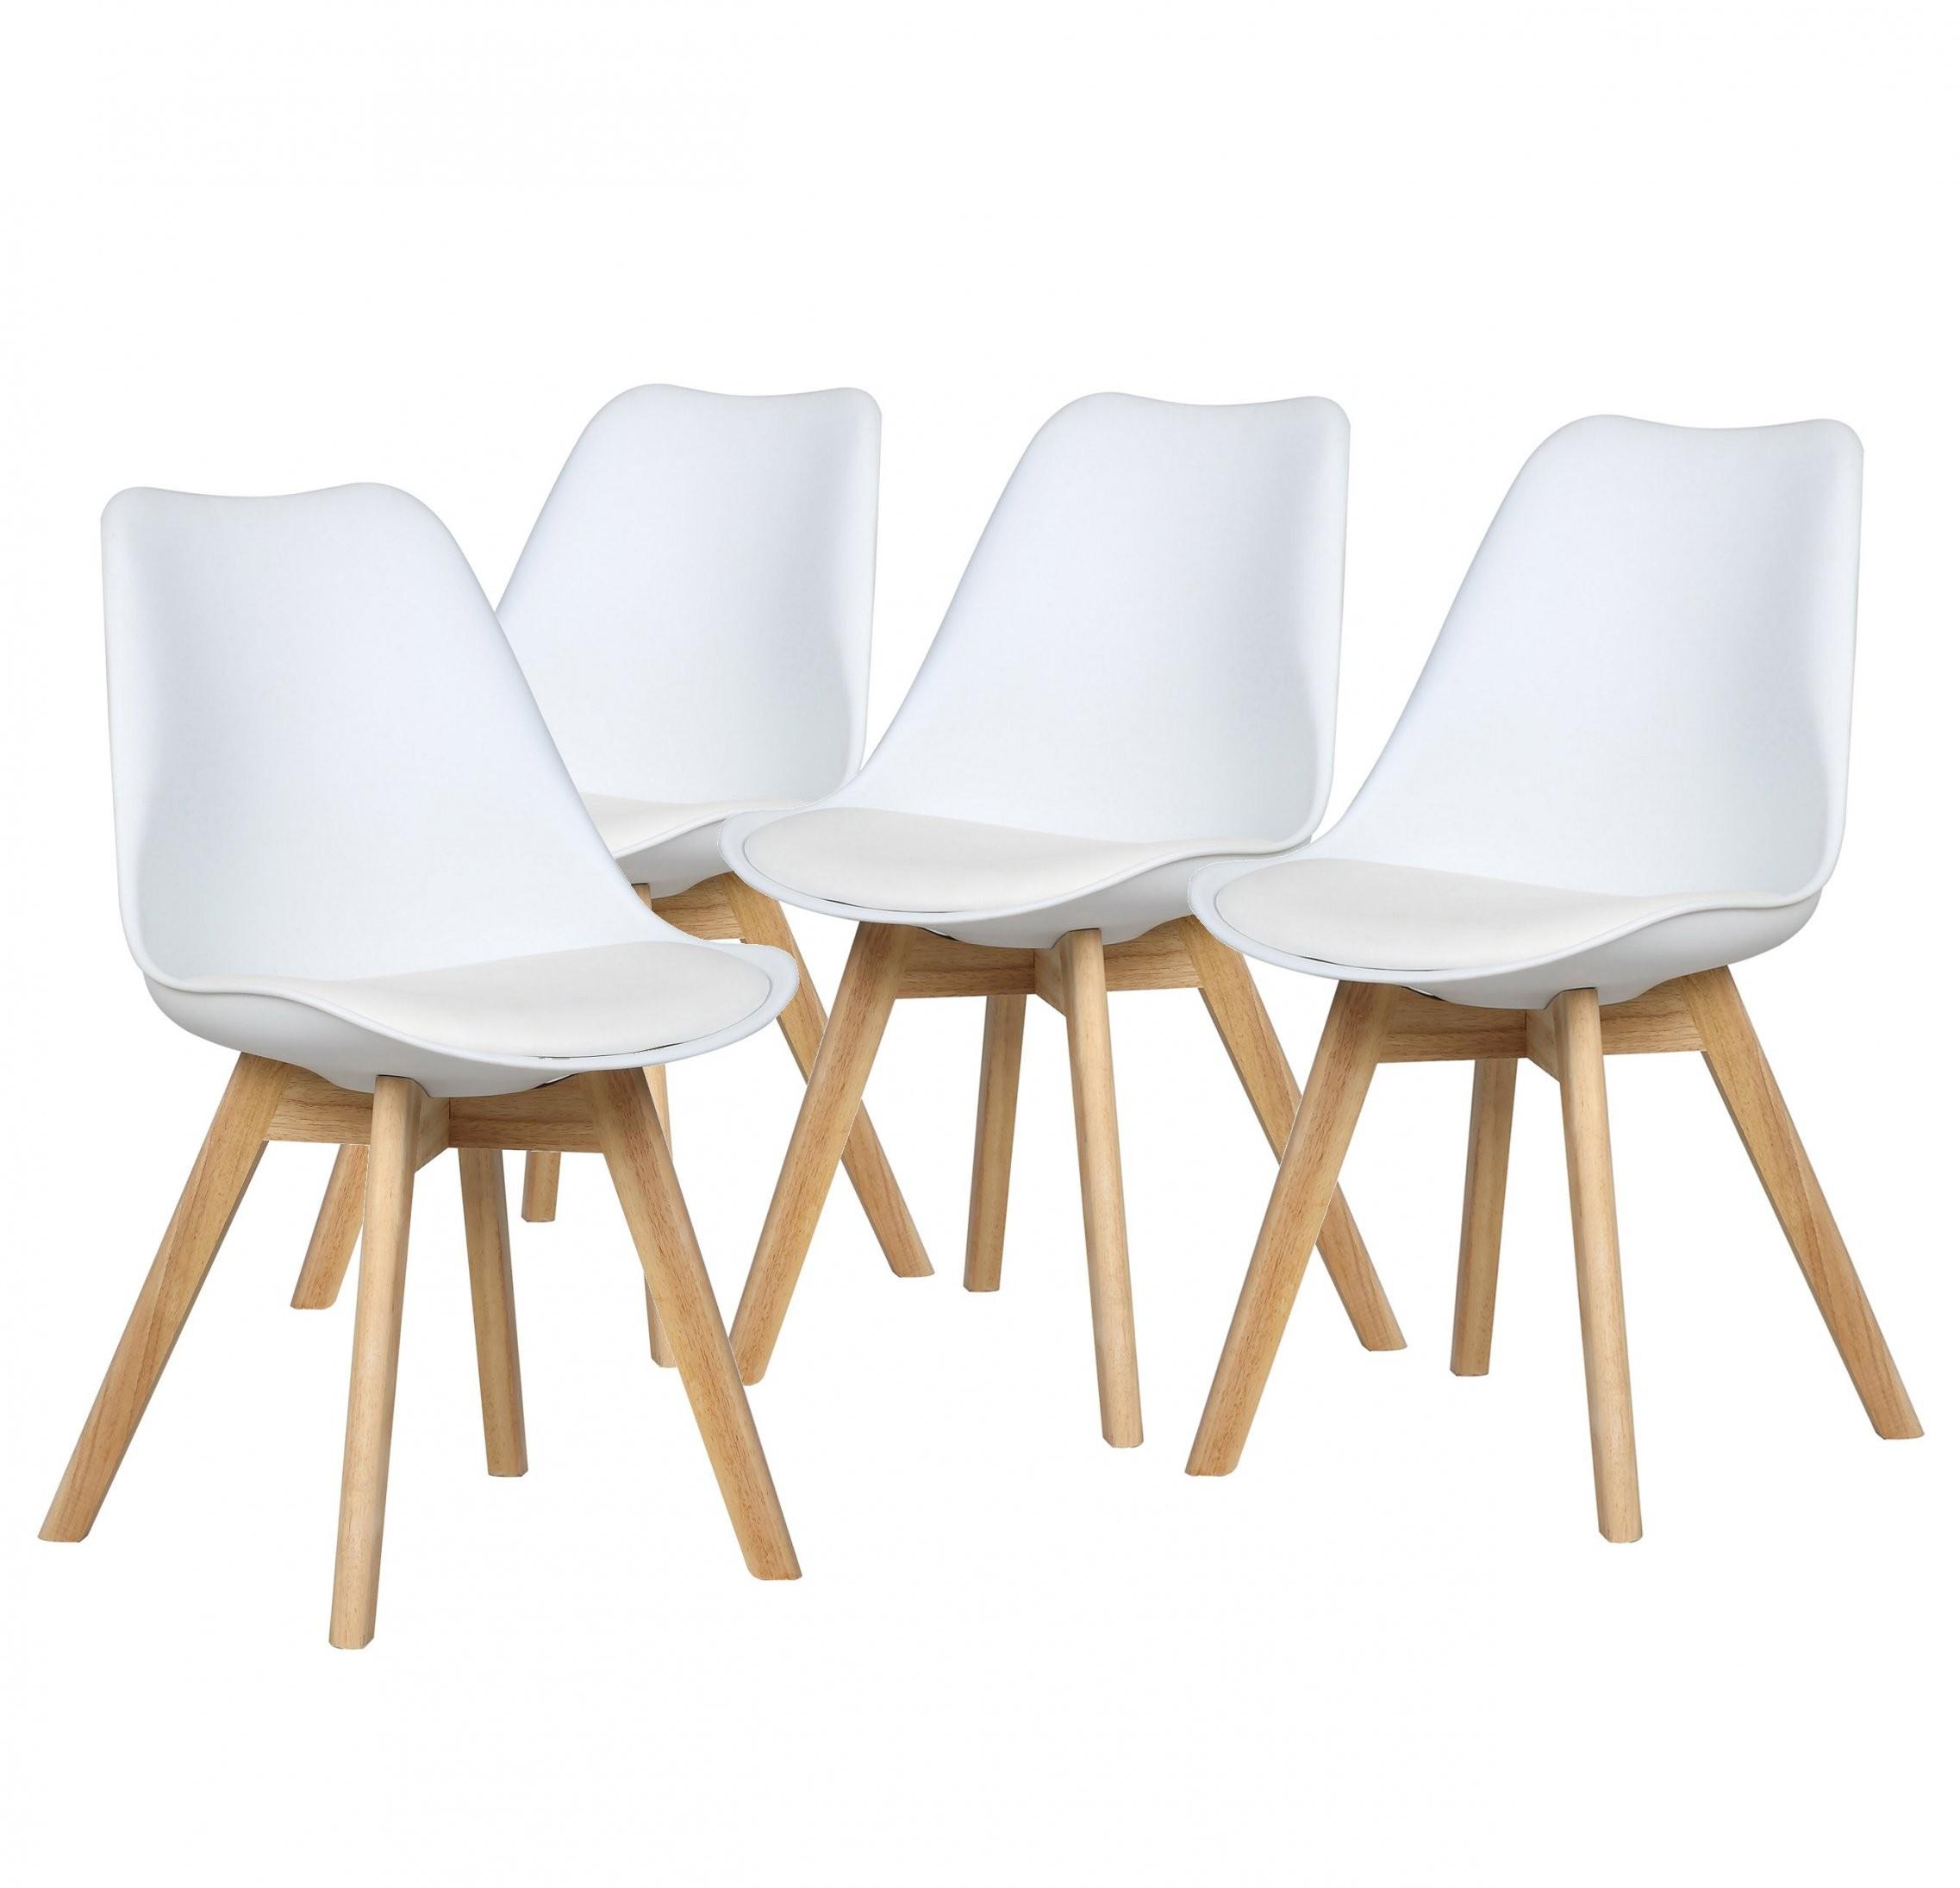 Stühle Malmö  4Er Set Stühle Skandinavisches Design  Weiß Konnte von Stühle Skandinavisches Design Photo